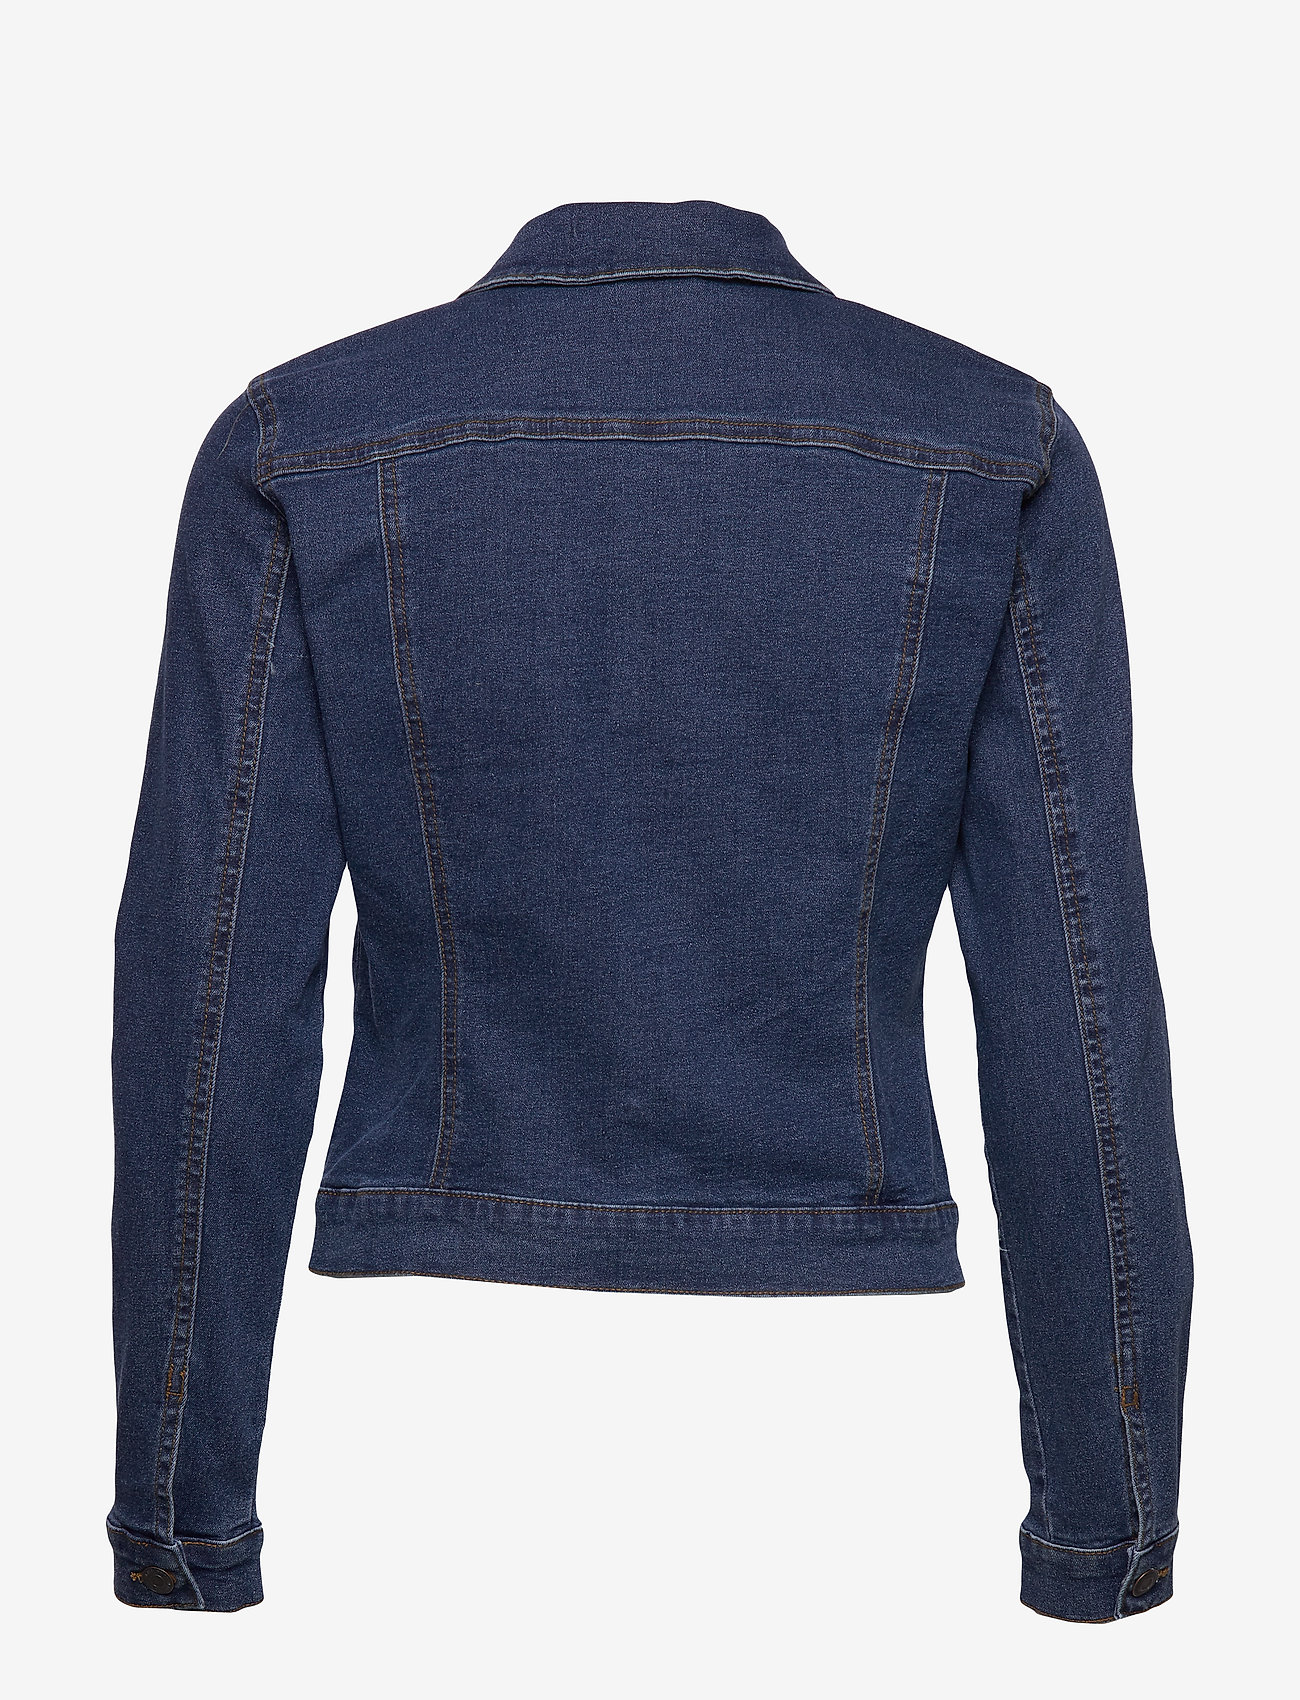 Vero Moda - VMHOT SOYA LS DENIM JACKET MIX GA - jeansjackor - medium blue denim - 1